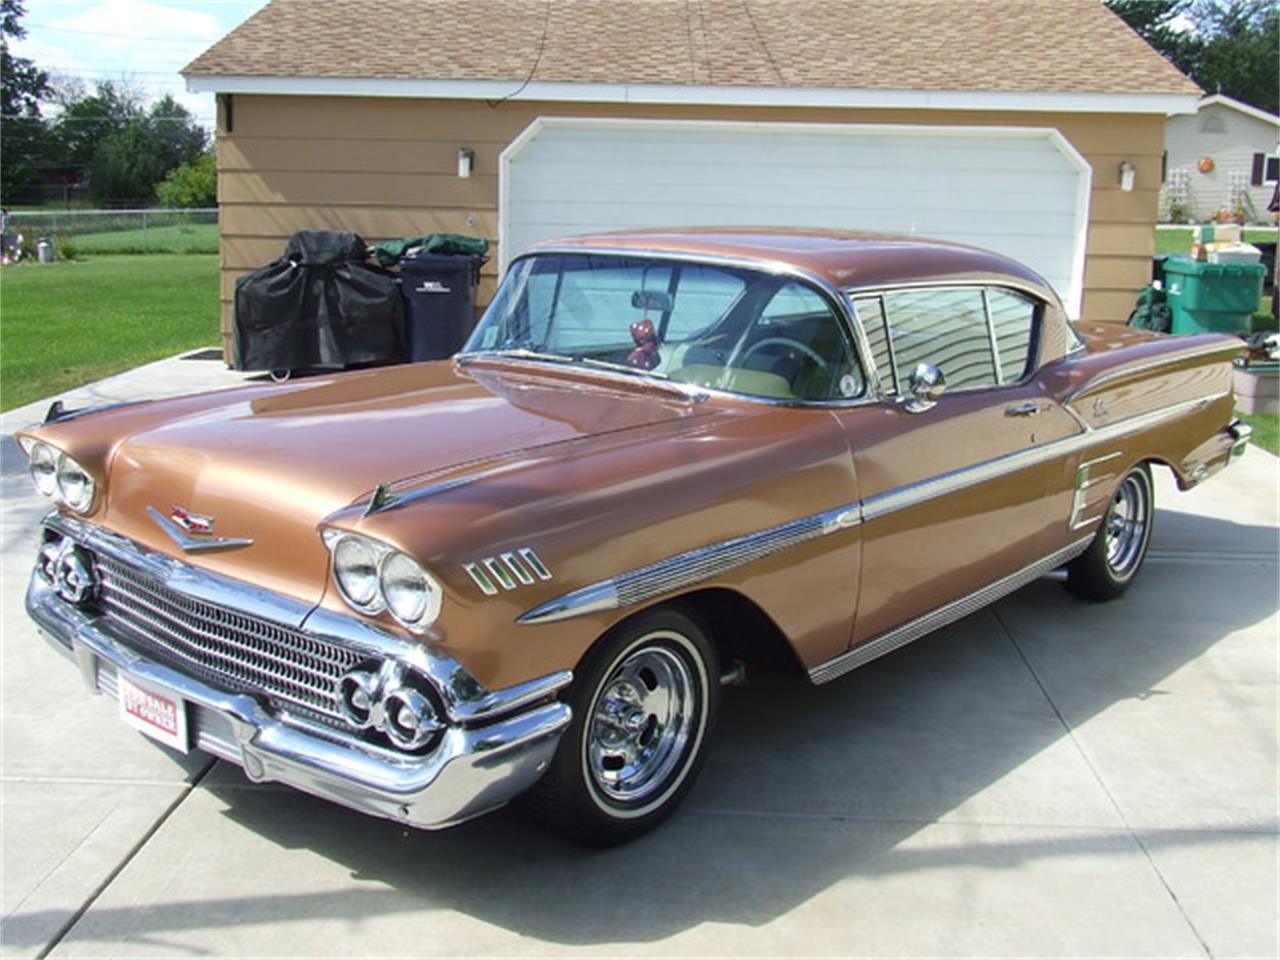 1958 chevrolet impala for sale cc 582759. Black Bedroom Furniture Sets. Home Design Ideas